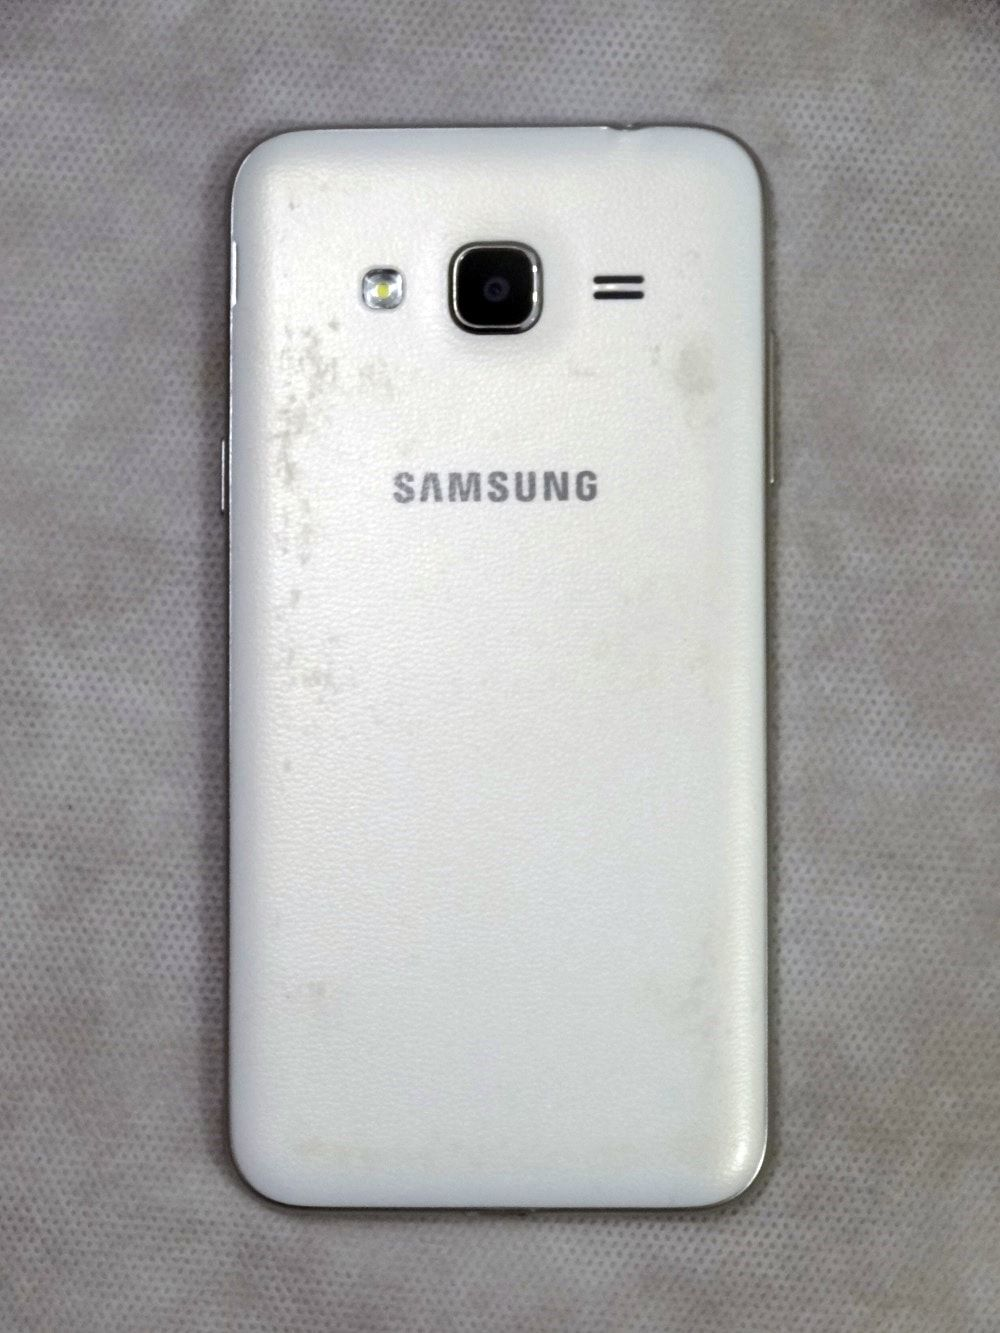 Smartphone Samsung Galaxy J3 Dual Chip Android 5.1 Tela 5'' 8GB 4G Wi-Fi Câmera 8MP - Branco